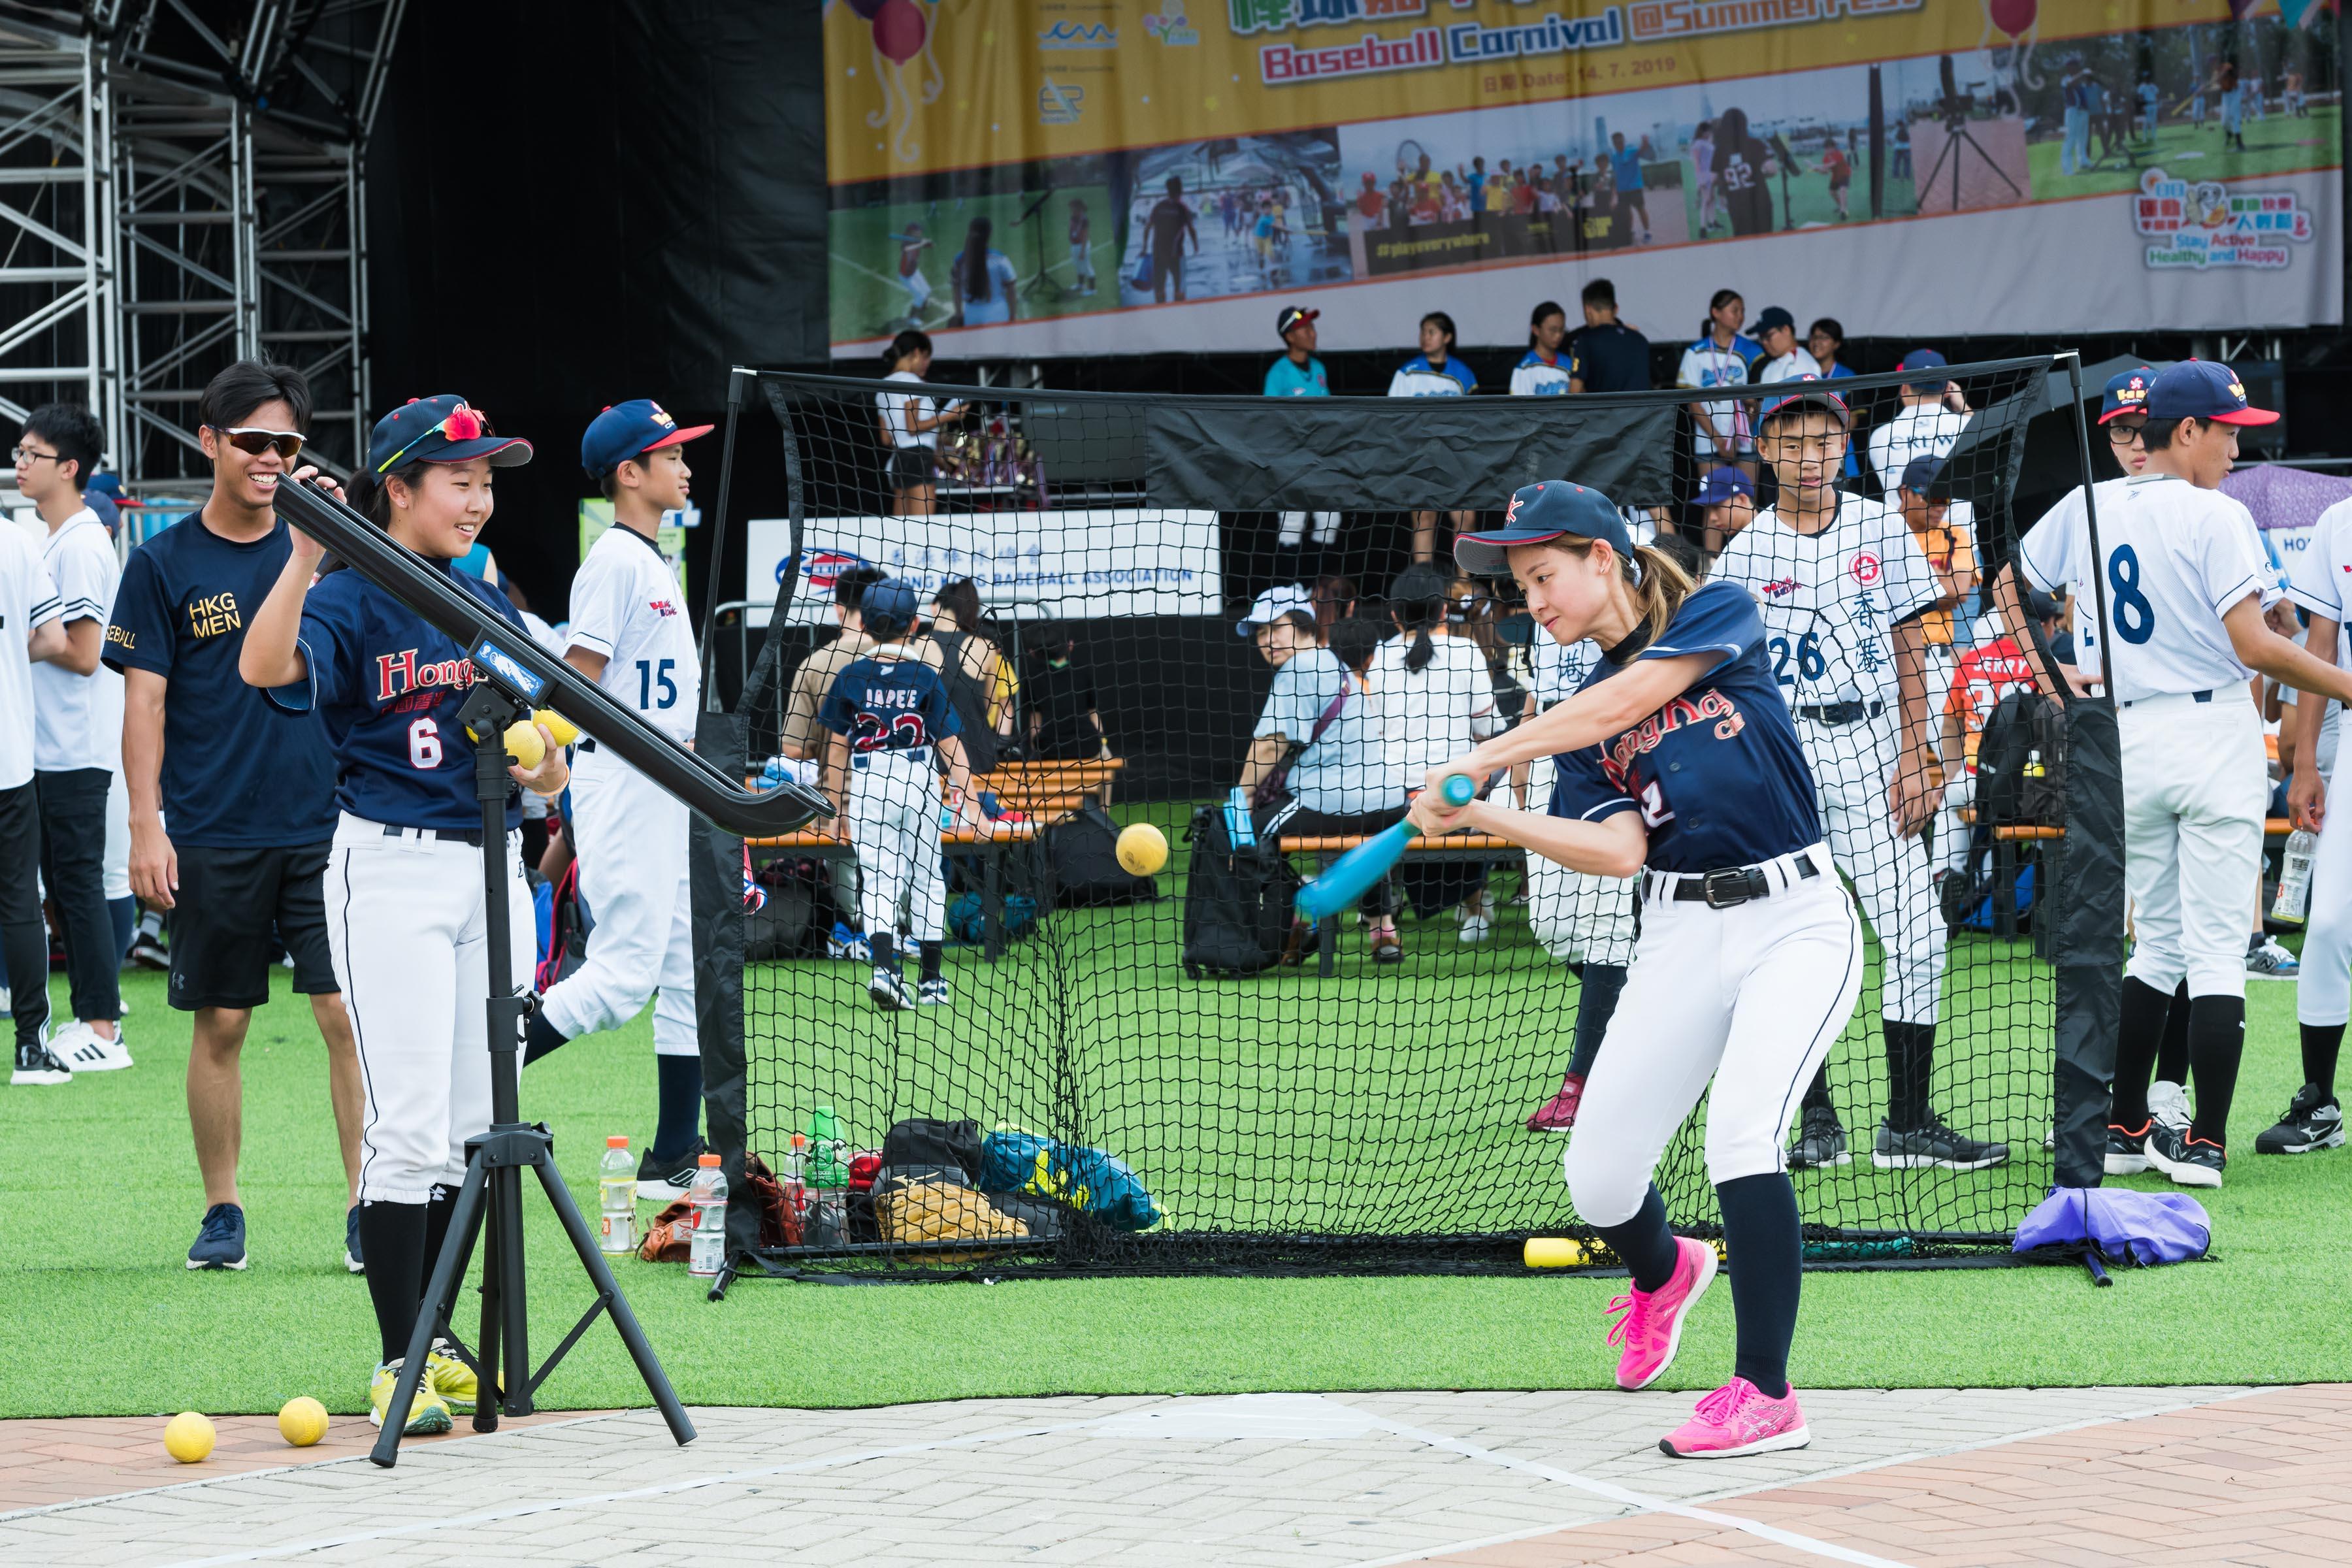 Baseball Carnival